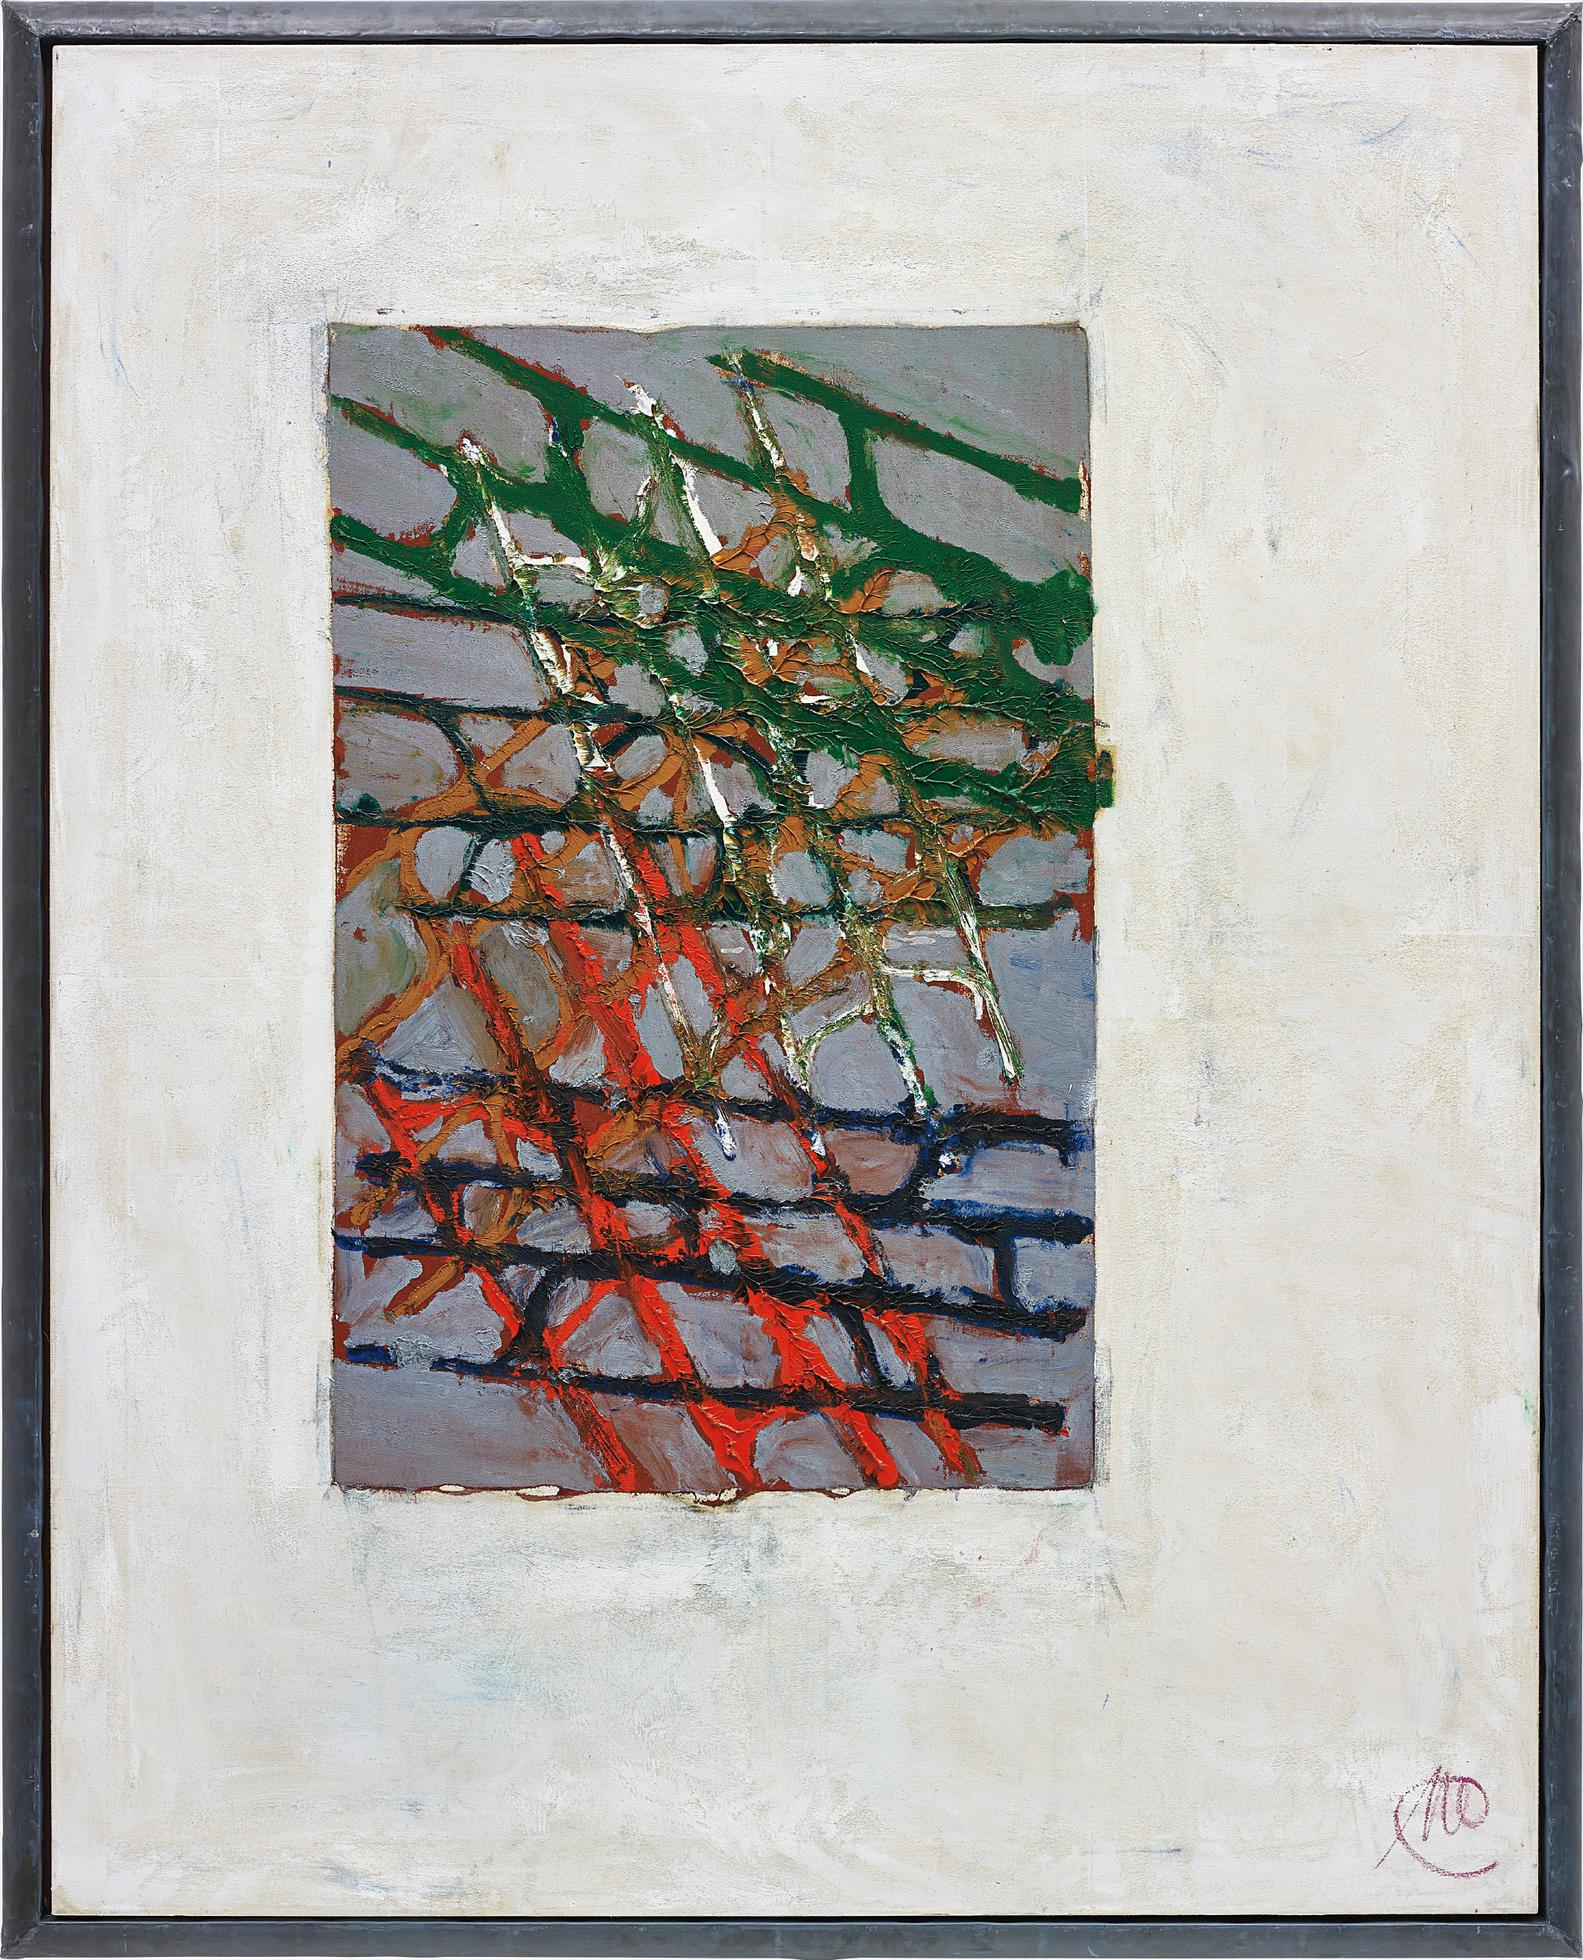 Markus Lupertz-Gitterbild-1999